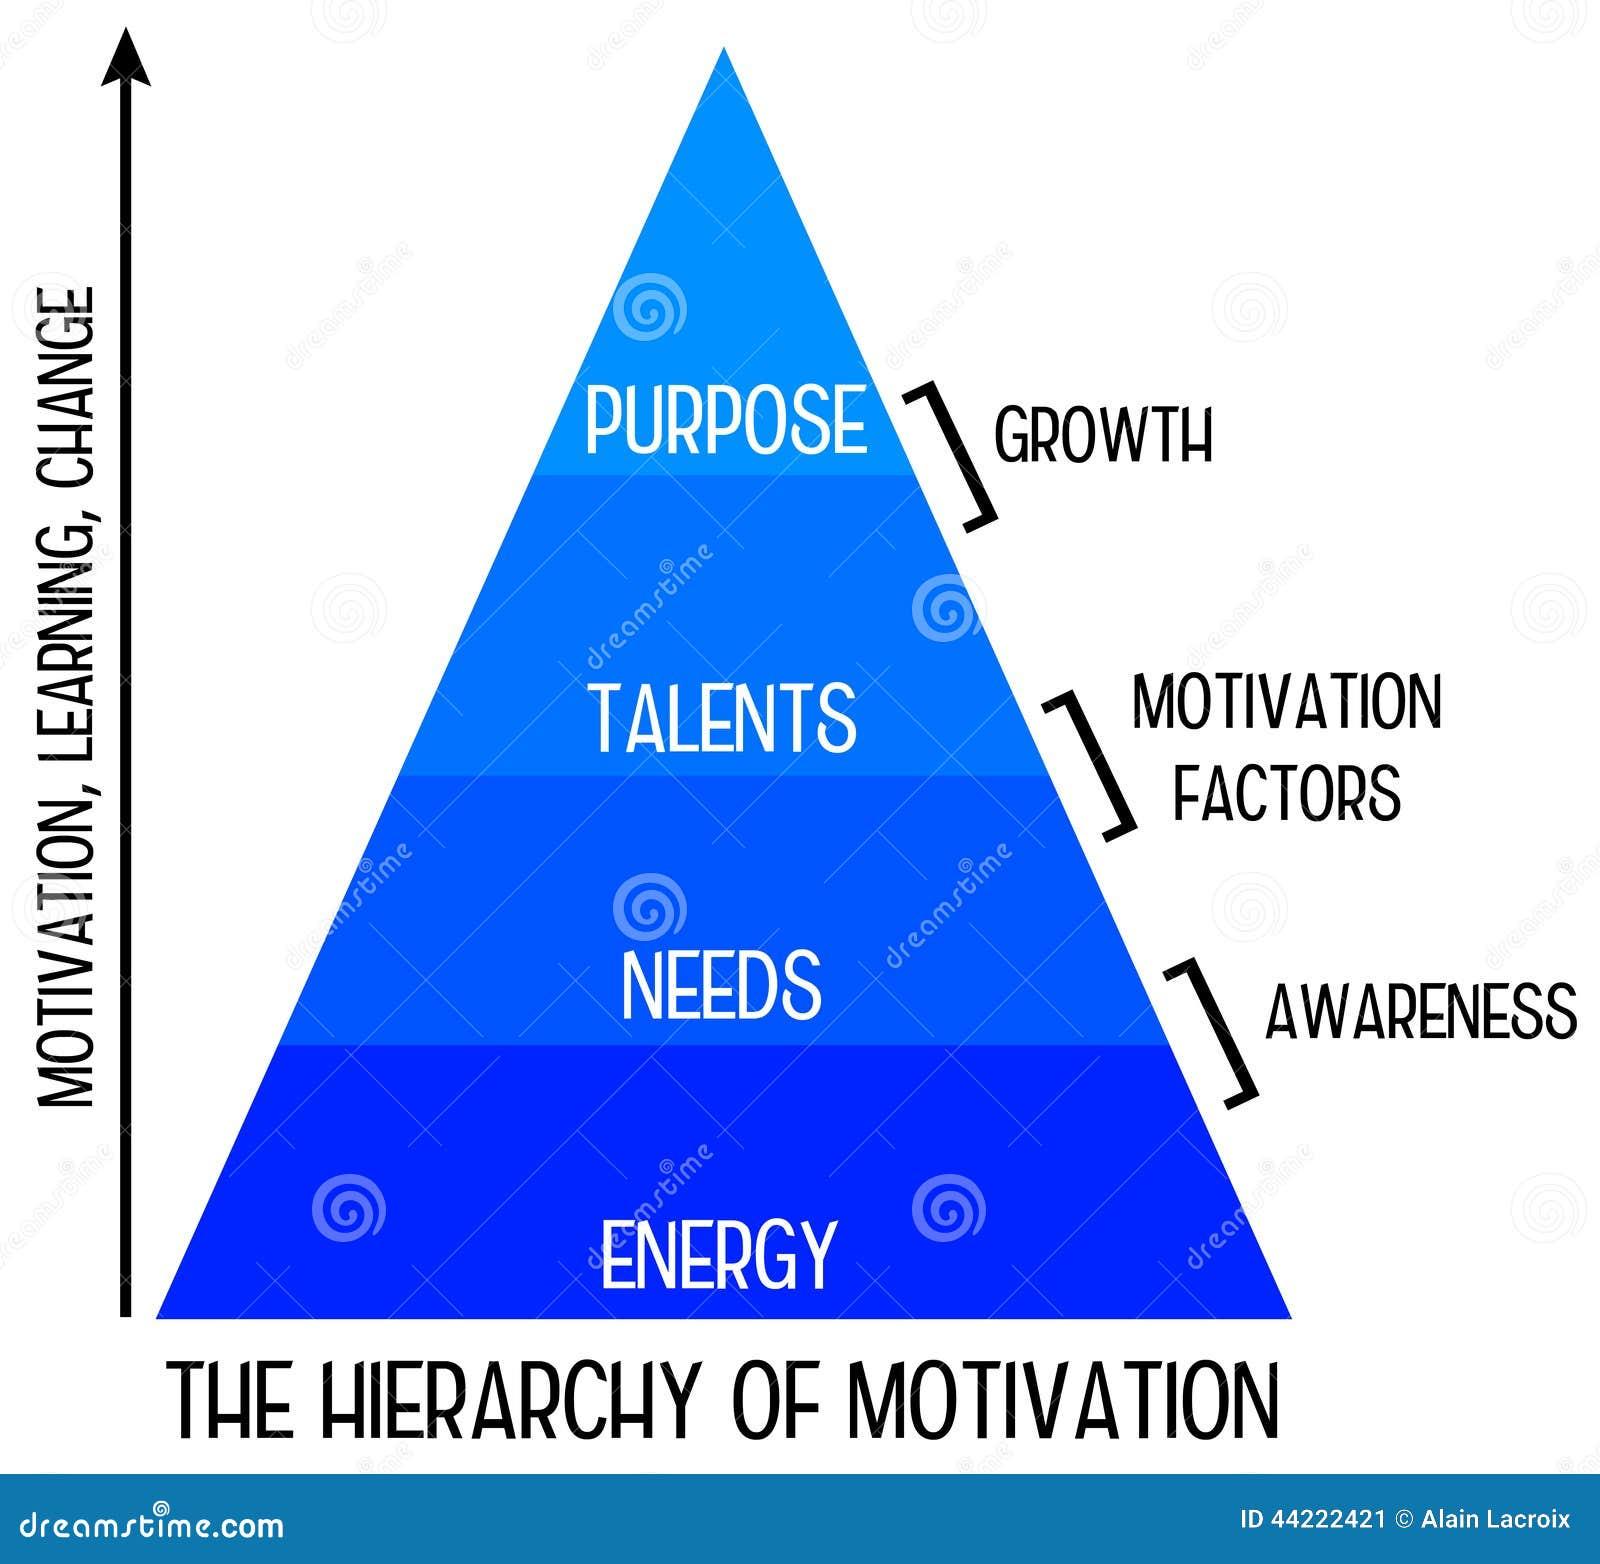 Motywaci hierarchia